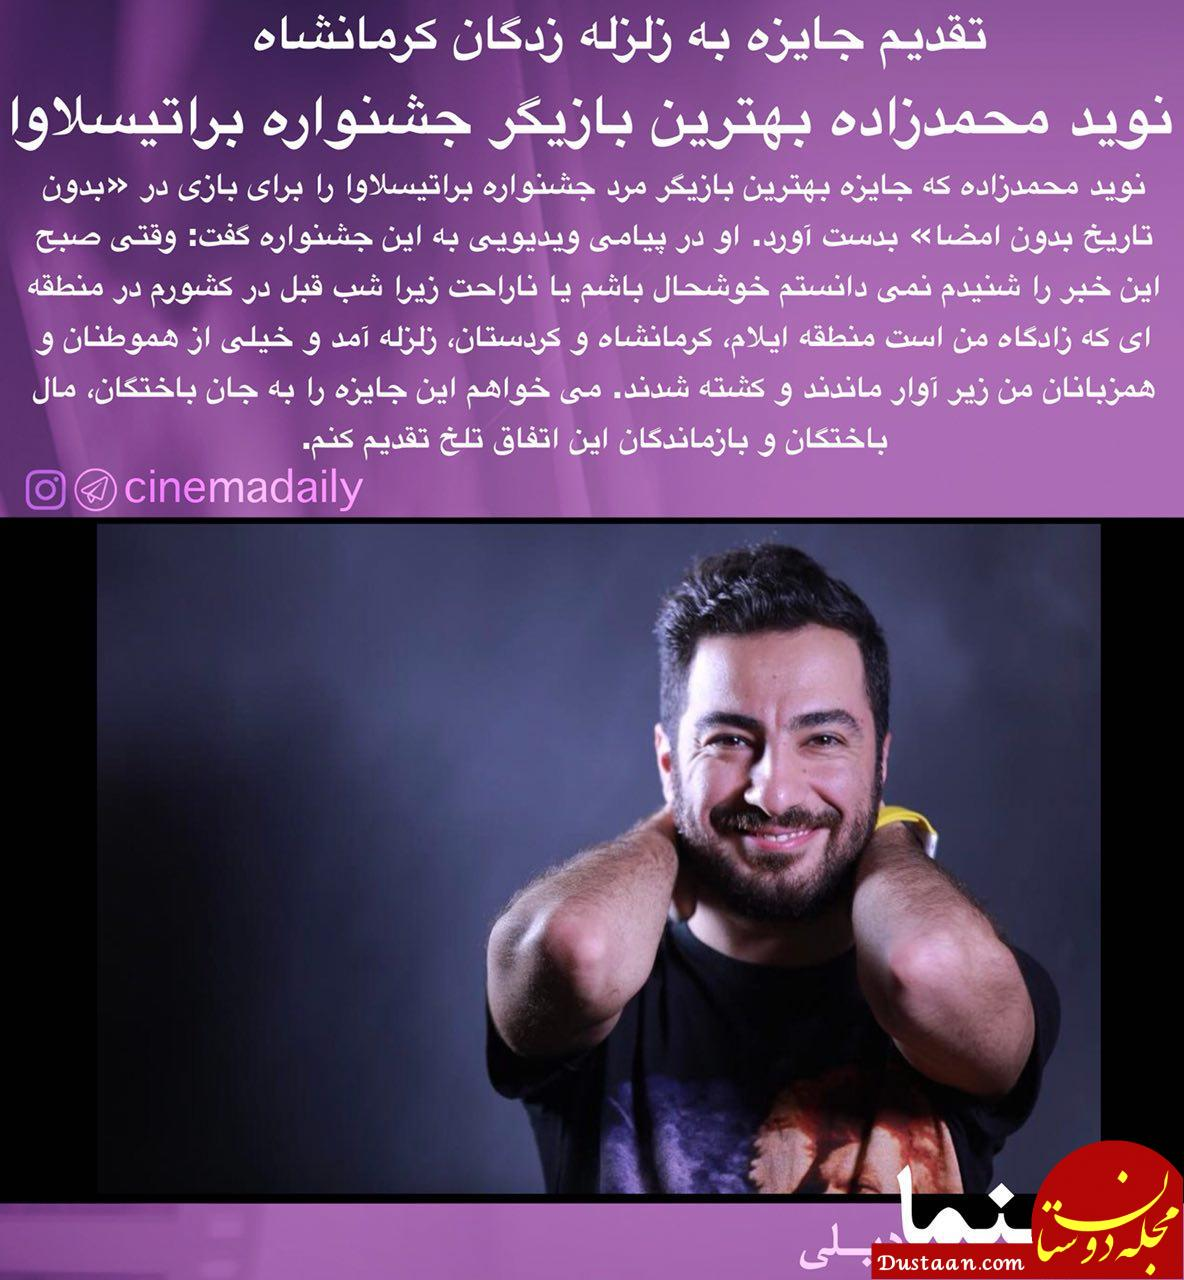 www.dustaan.com نوید محمدزاده جایزه اش را تقدیم زلزله زدگان کرمانشاه کرد +عکس